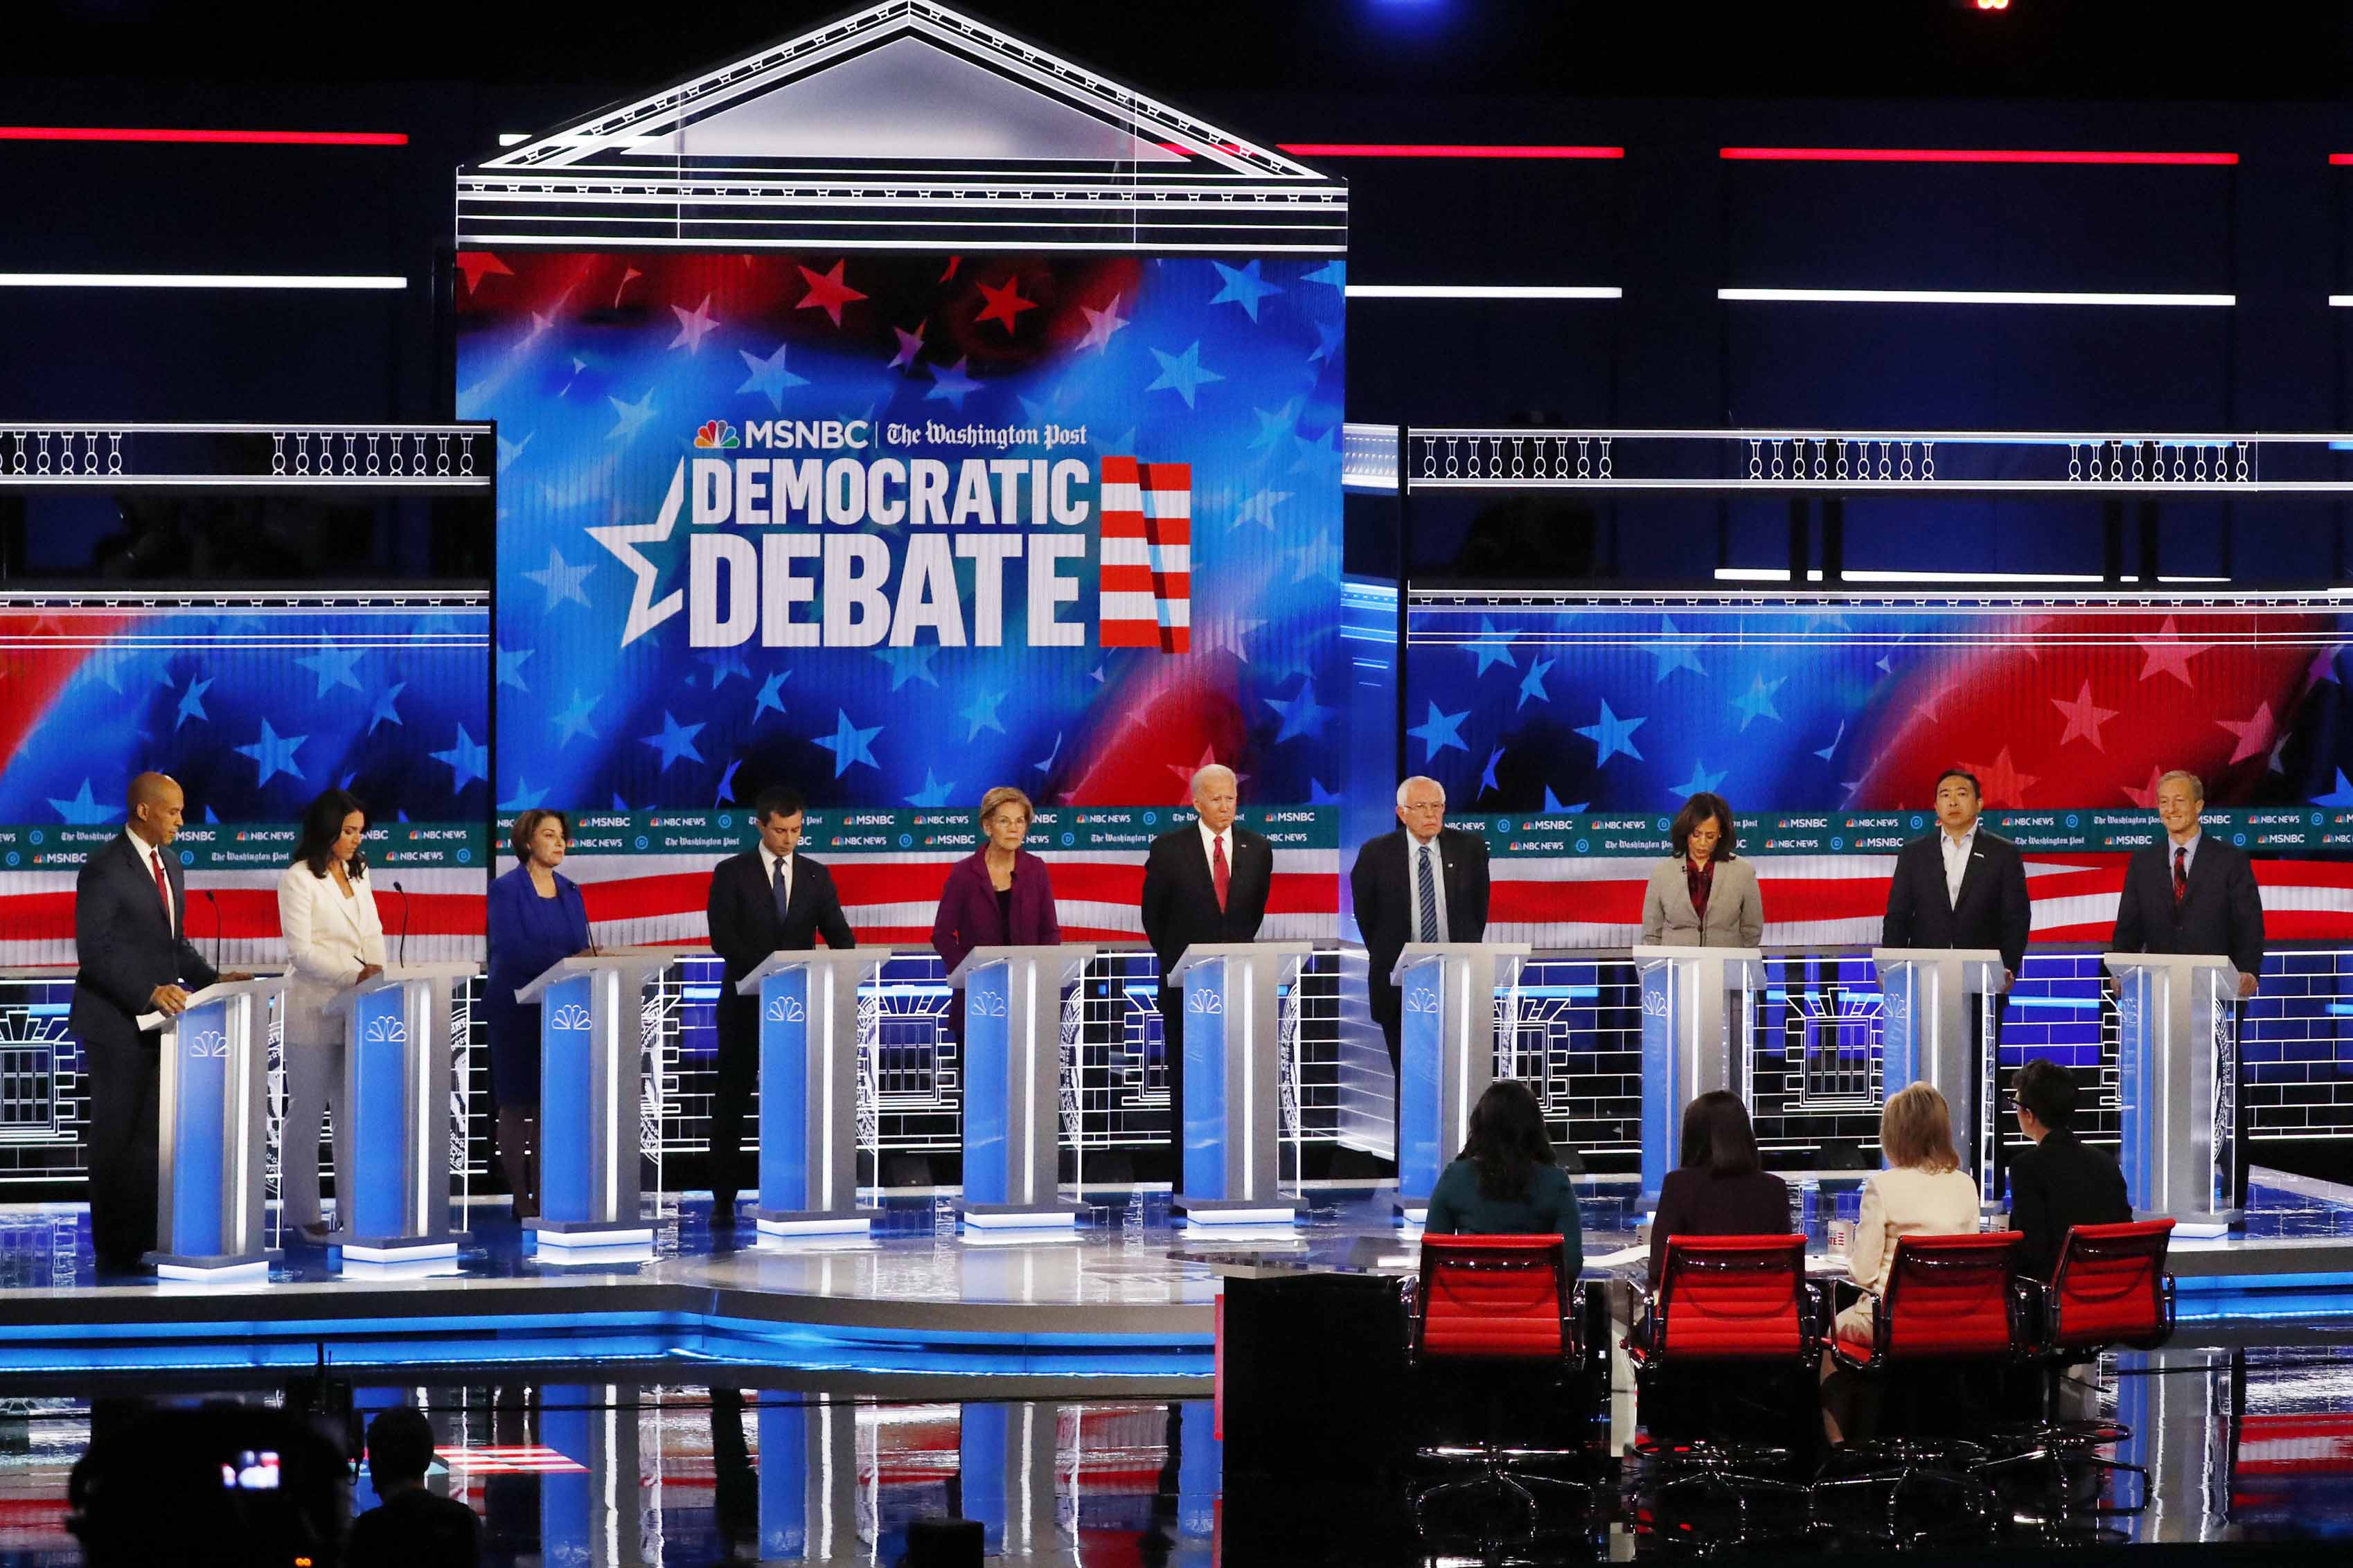 Democratic presidential candidates participate in a Democratic presidential primary debate on Nov. 20, 2019, in Atlanta. (AP)